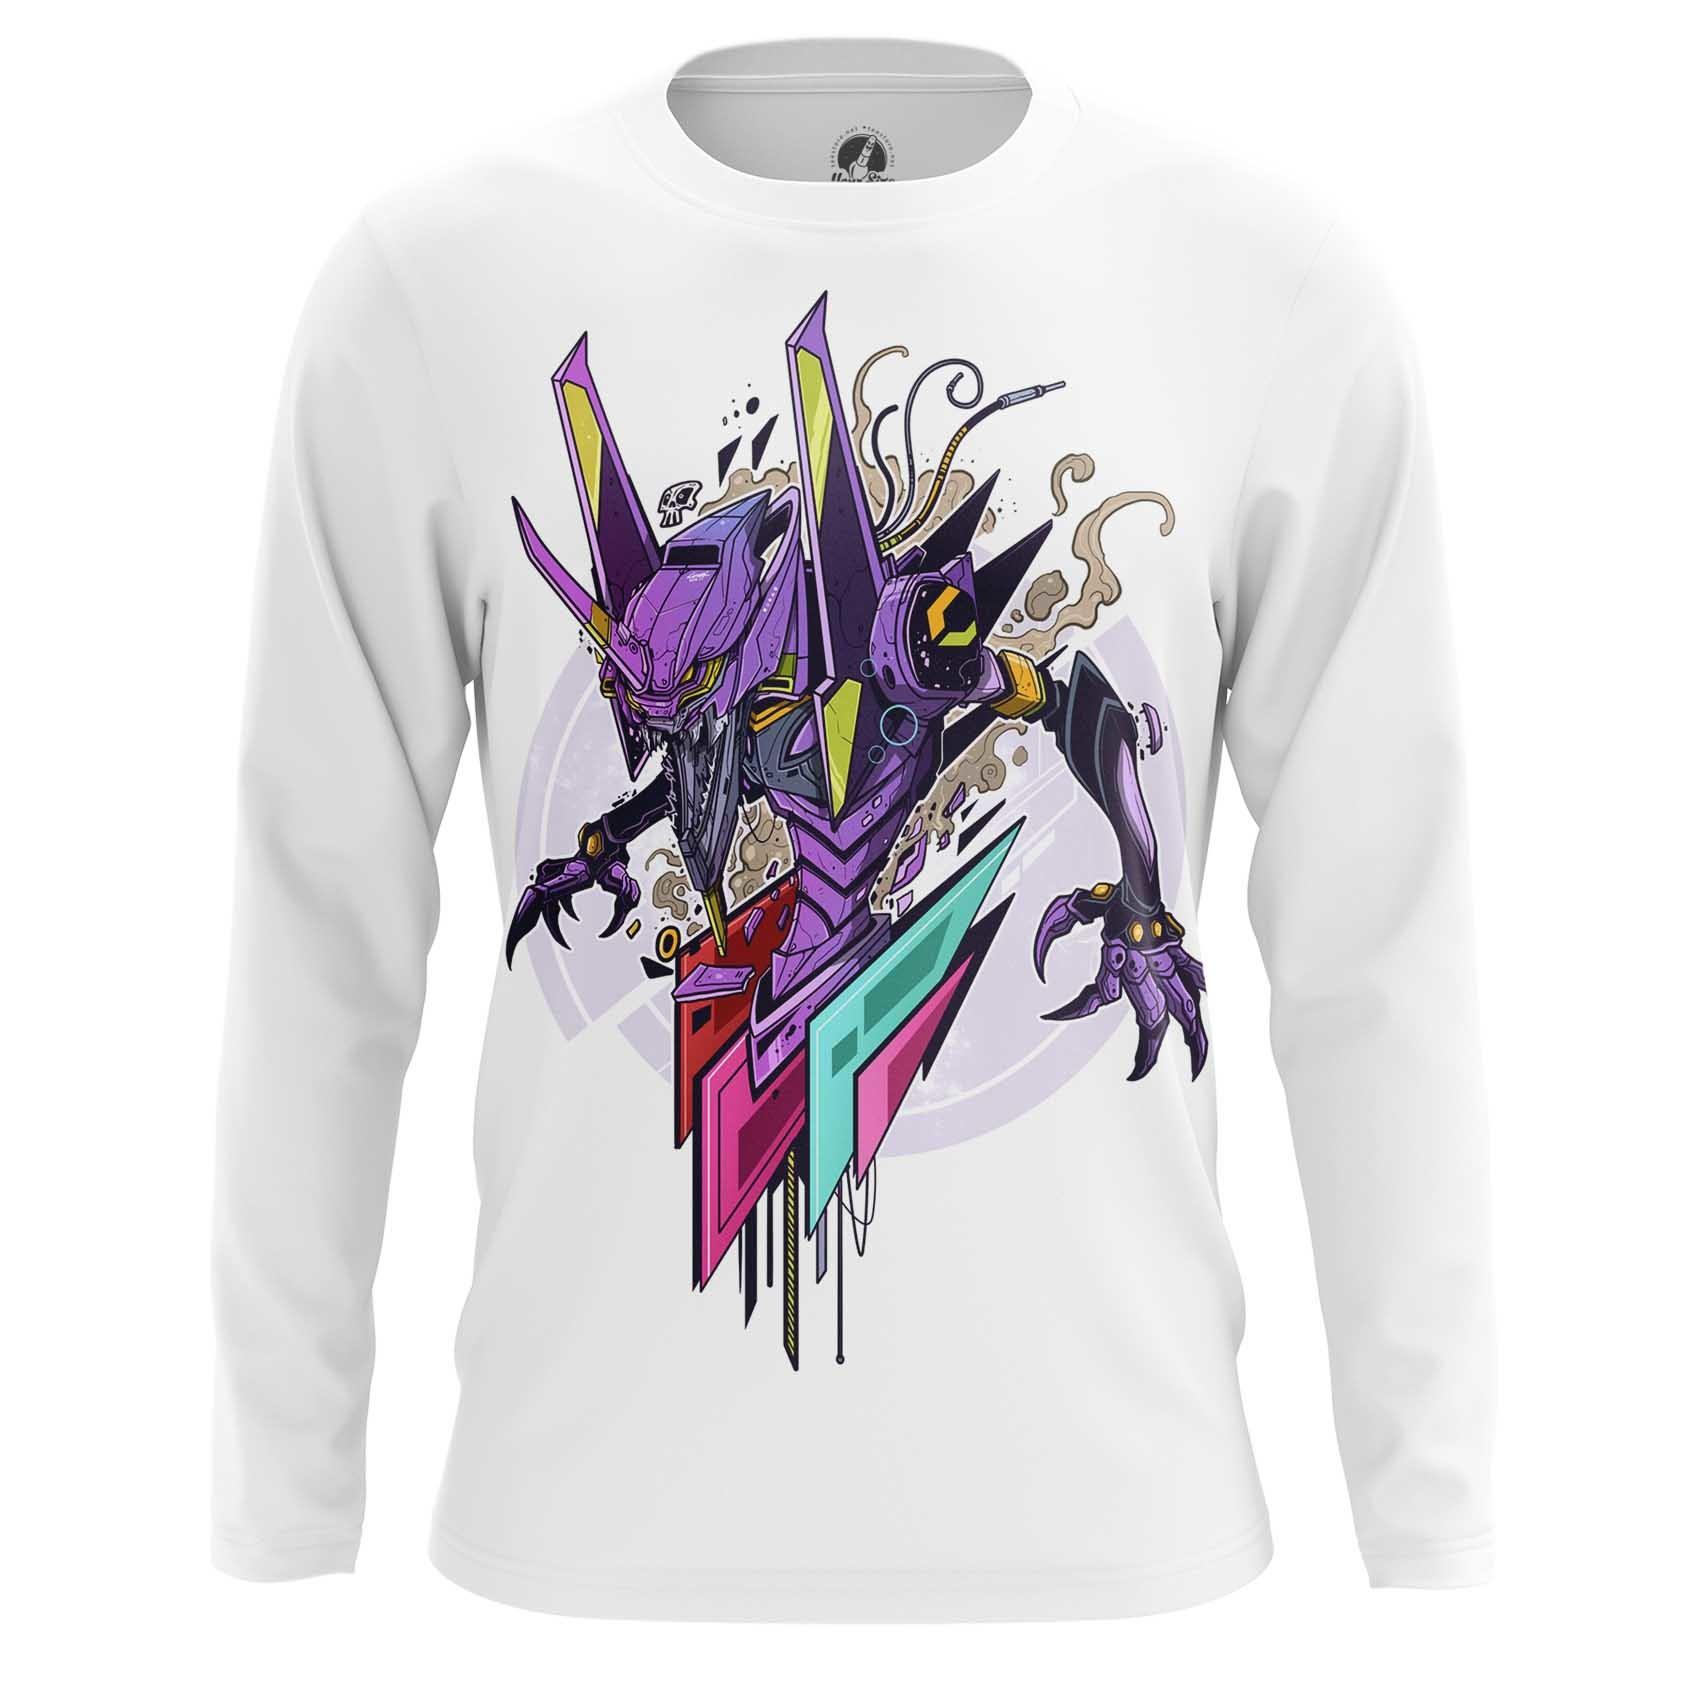 Merchandise Long Sleeve Unit 1 Art Eva Neon Genesis Evangelion